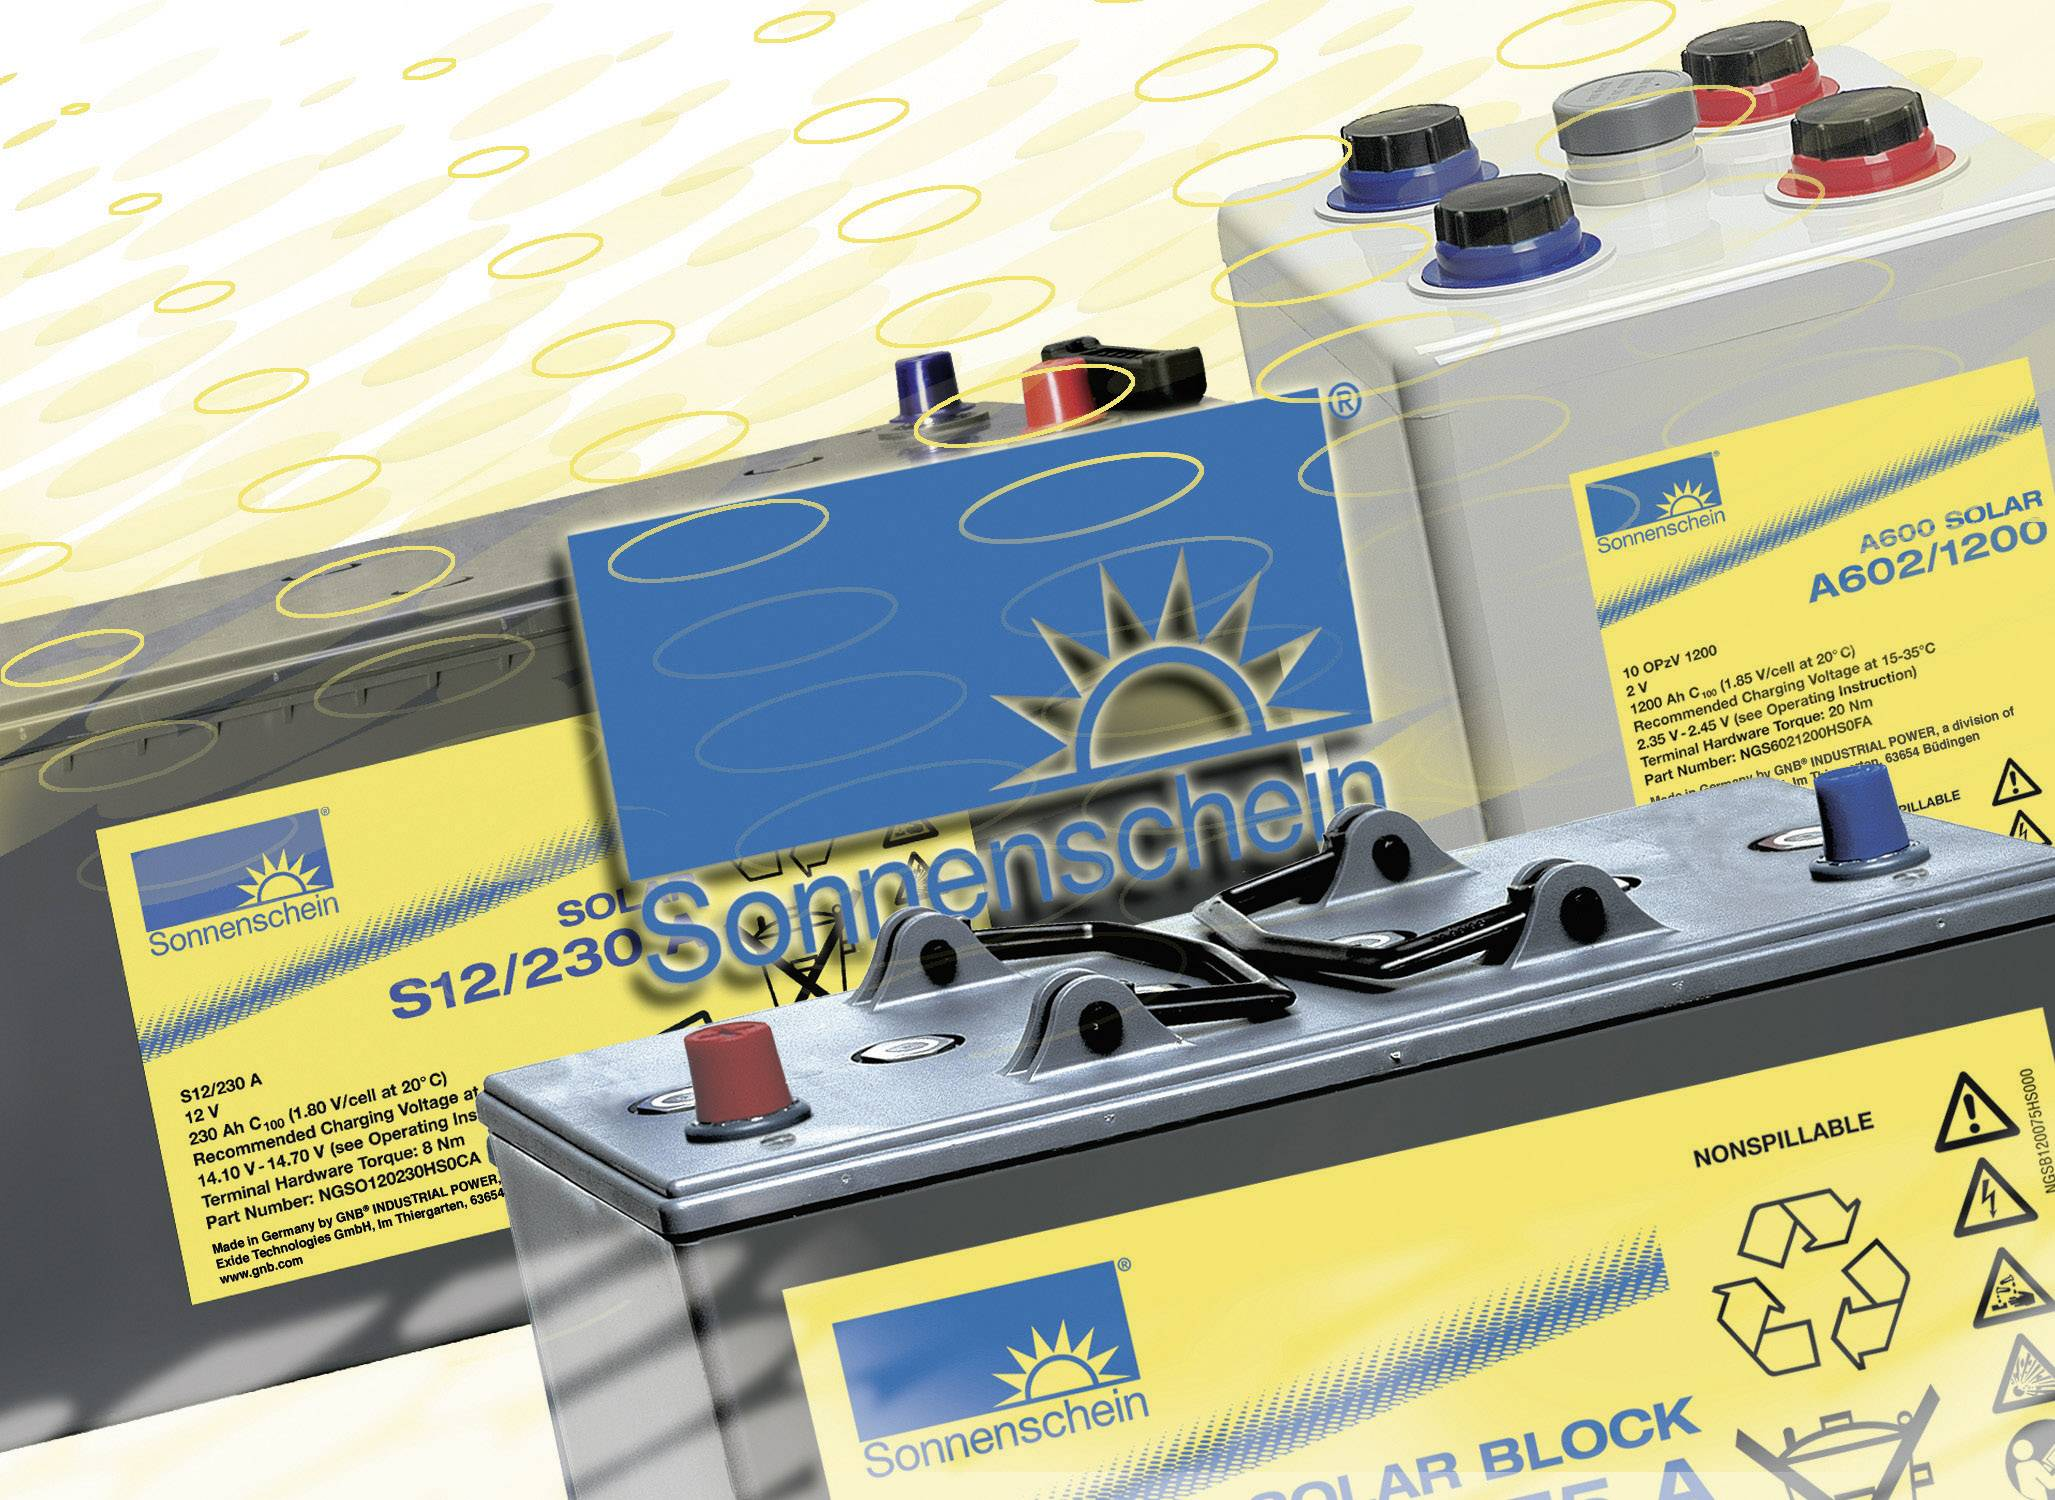 Solárny akumulátor GNB Sonnenschein dryfit S12/85 A S 12/85 A, 12 V, 85 Ah